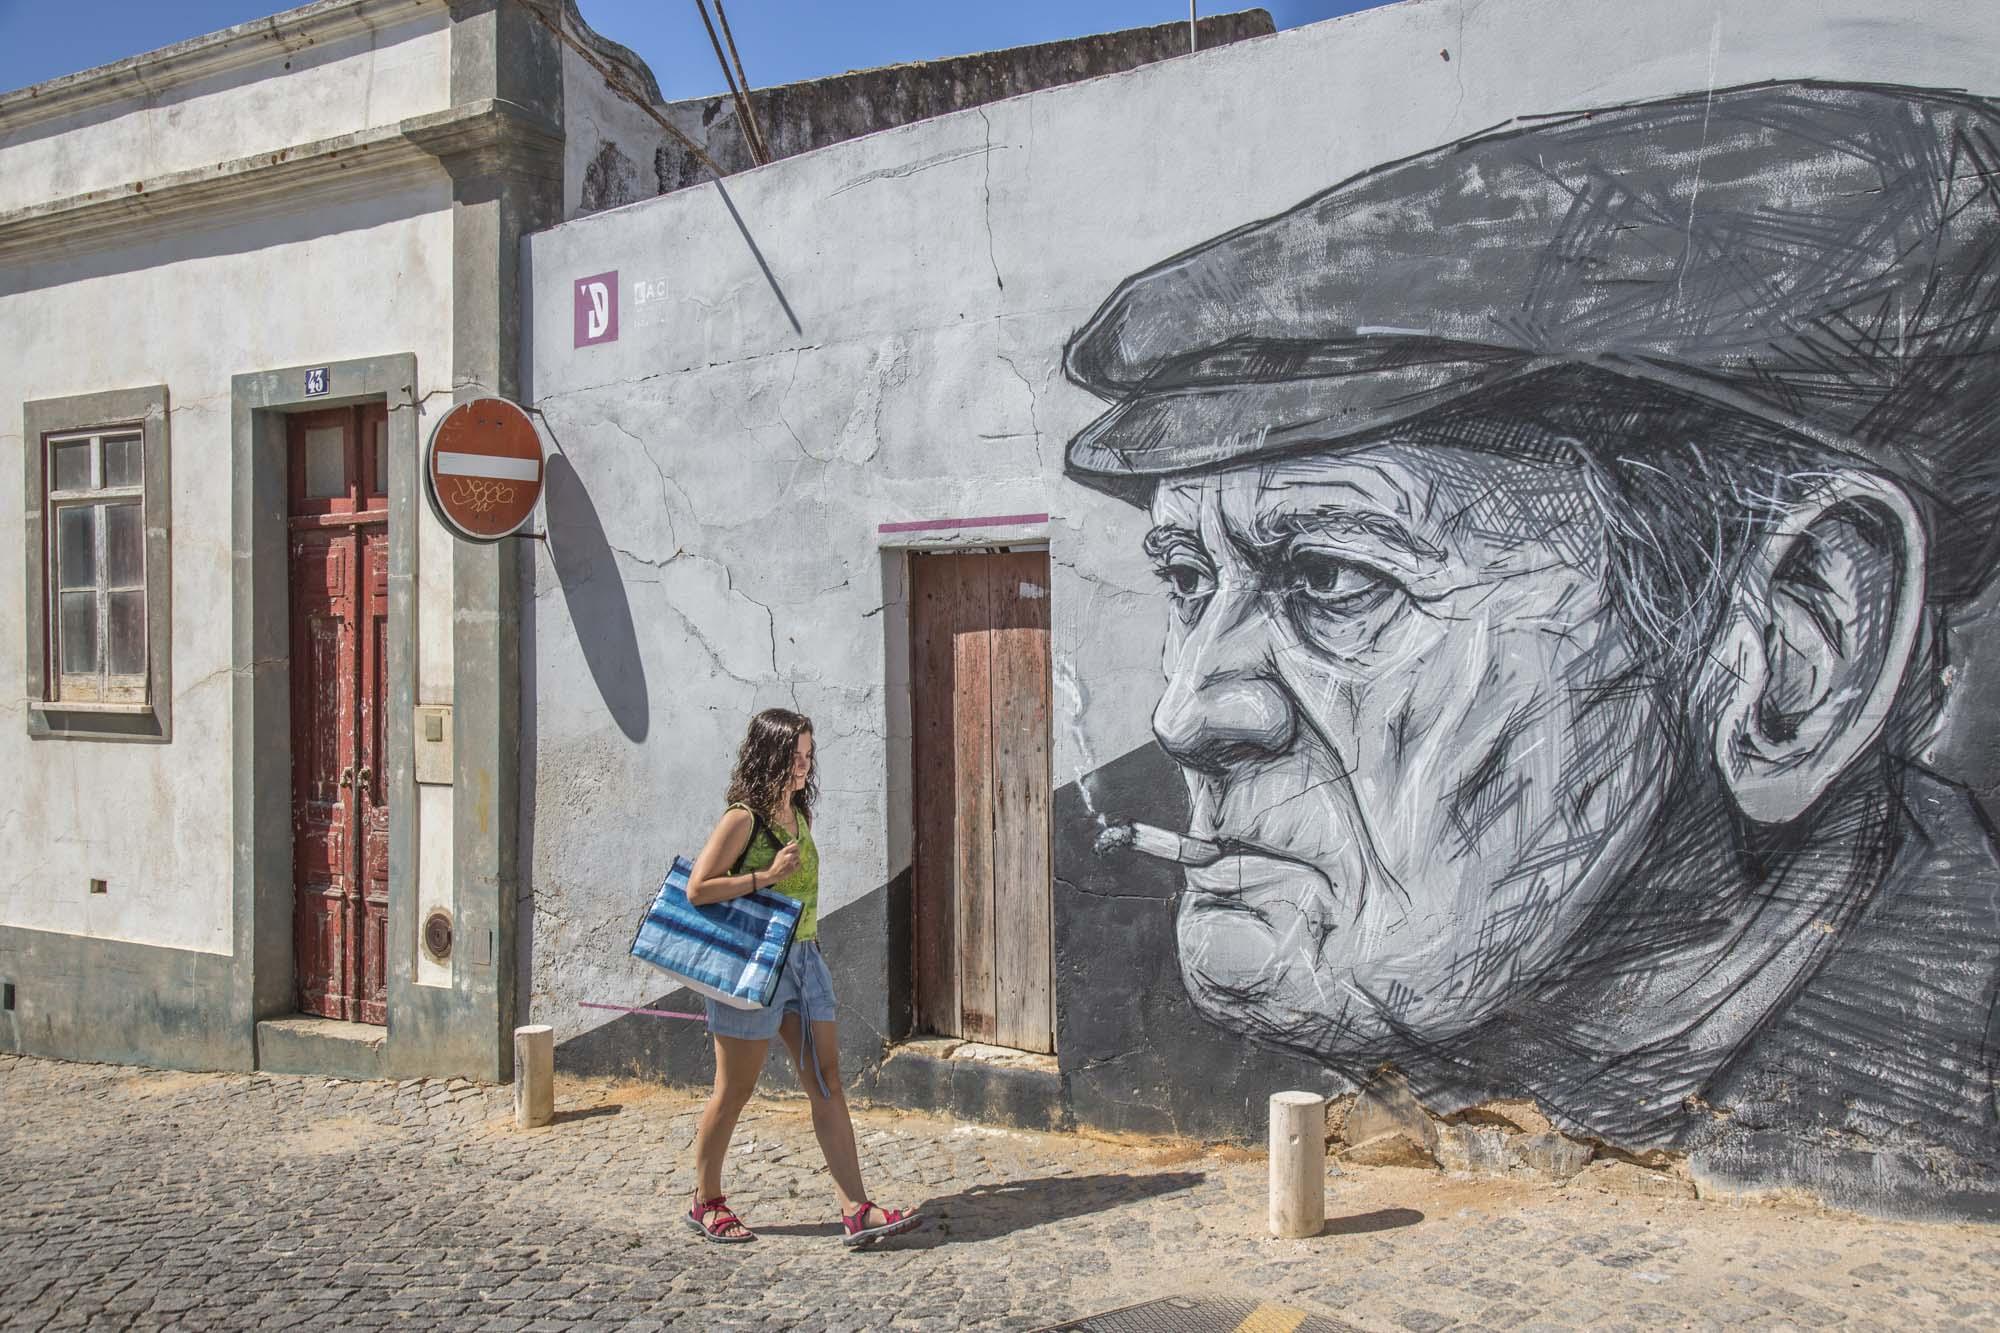 Portugal, Algarve, Atlantikküste, Lagos, Graffiti, Wandmalerei, Altstadt, Fischerman